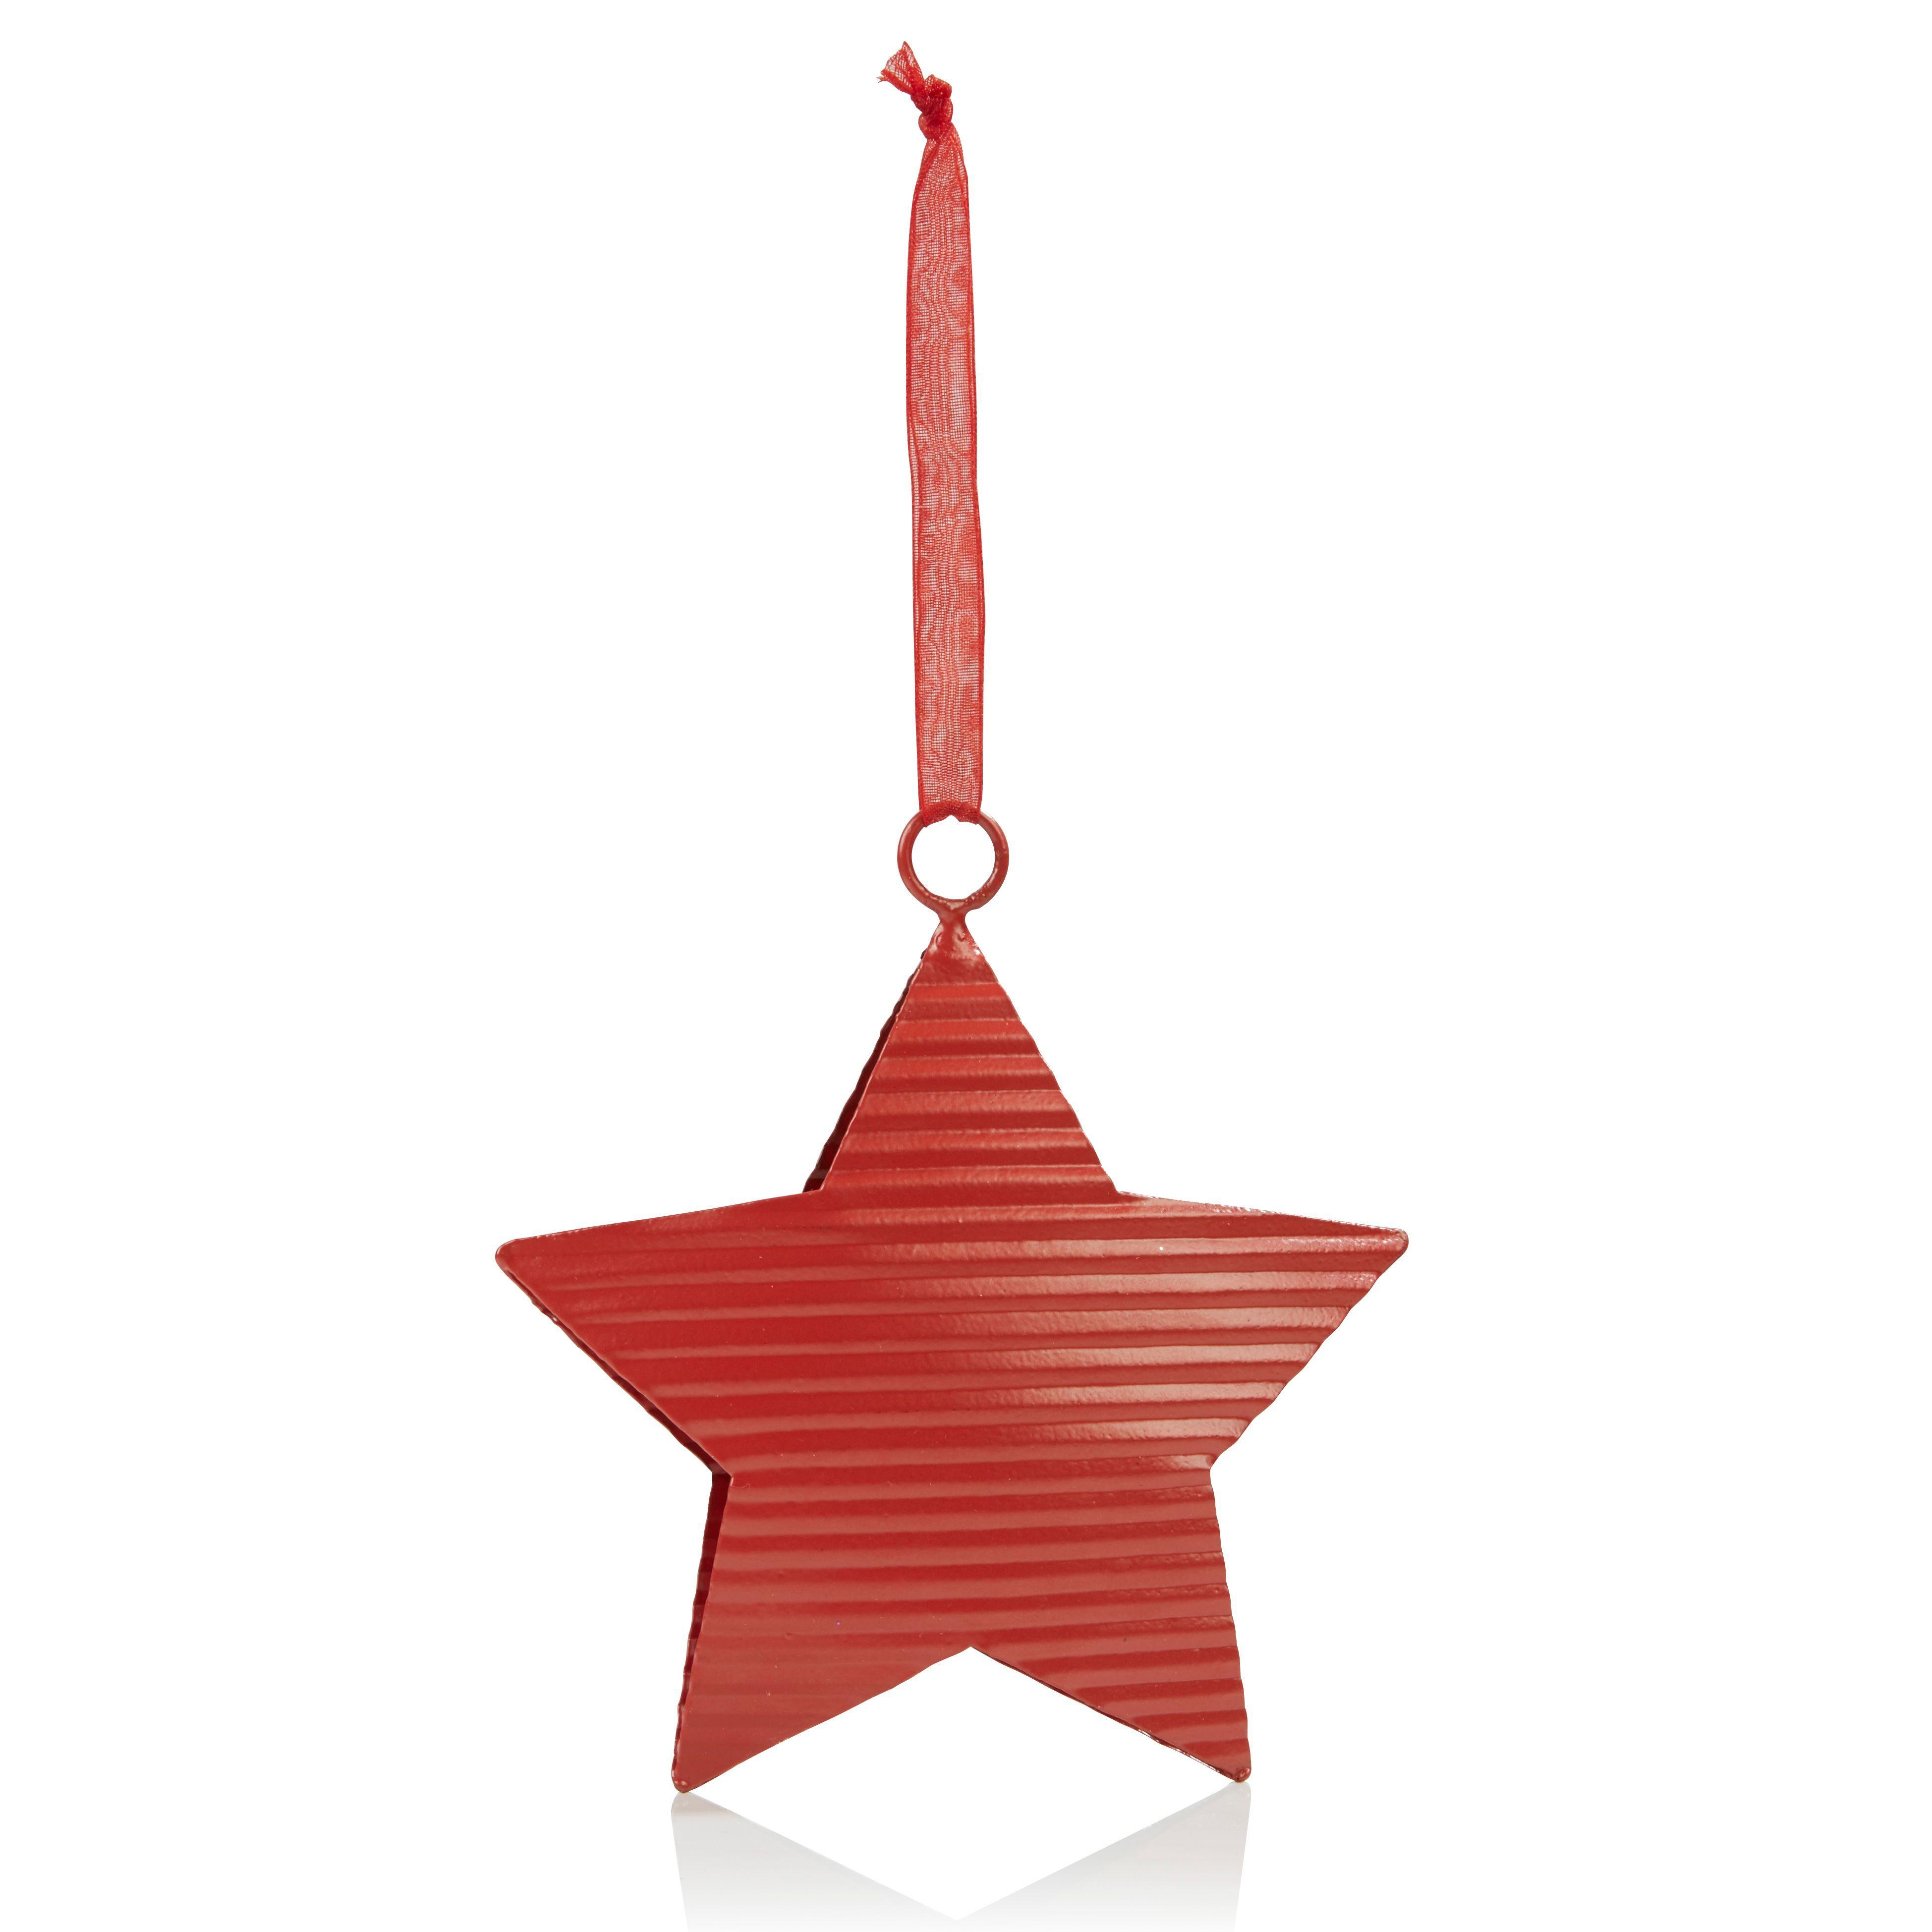 Corrugated Metal Red Star Tree Decoration